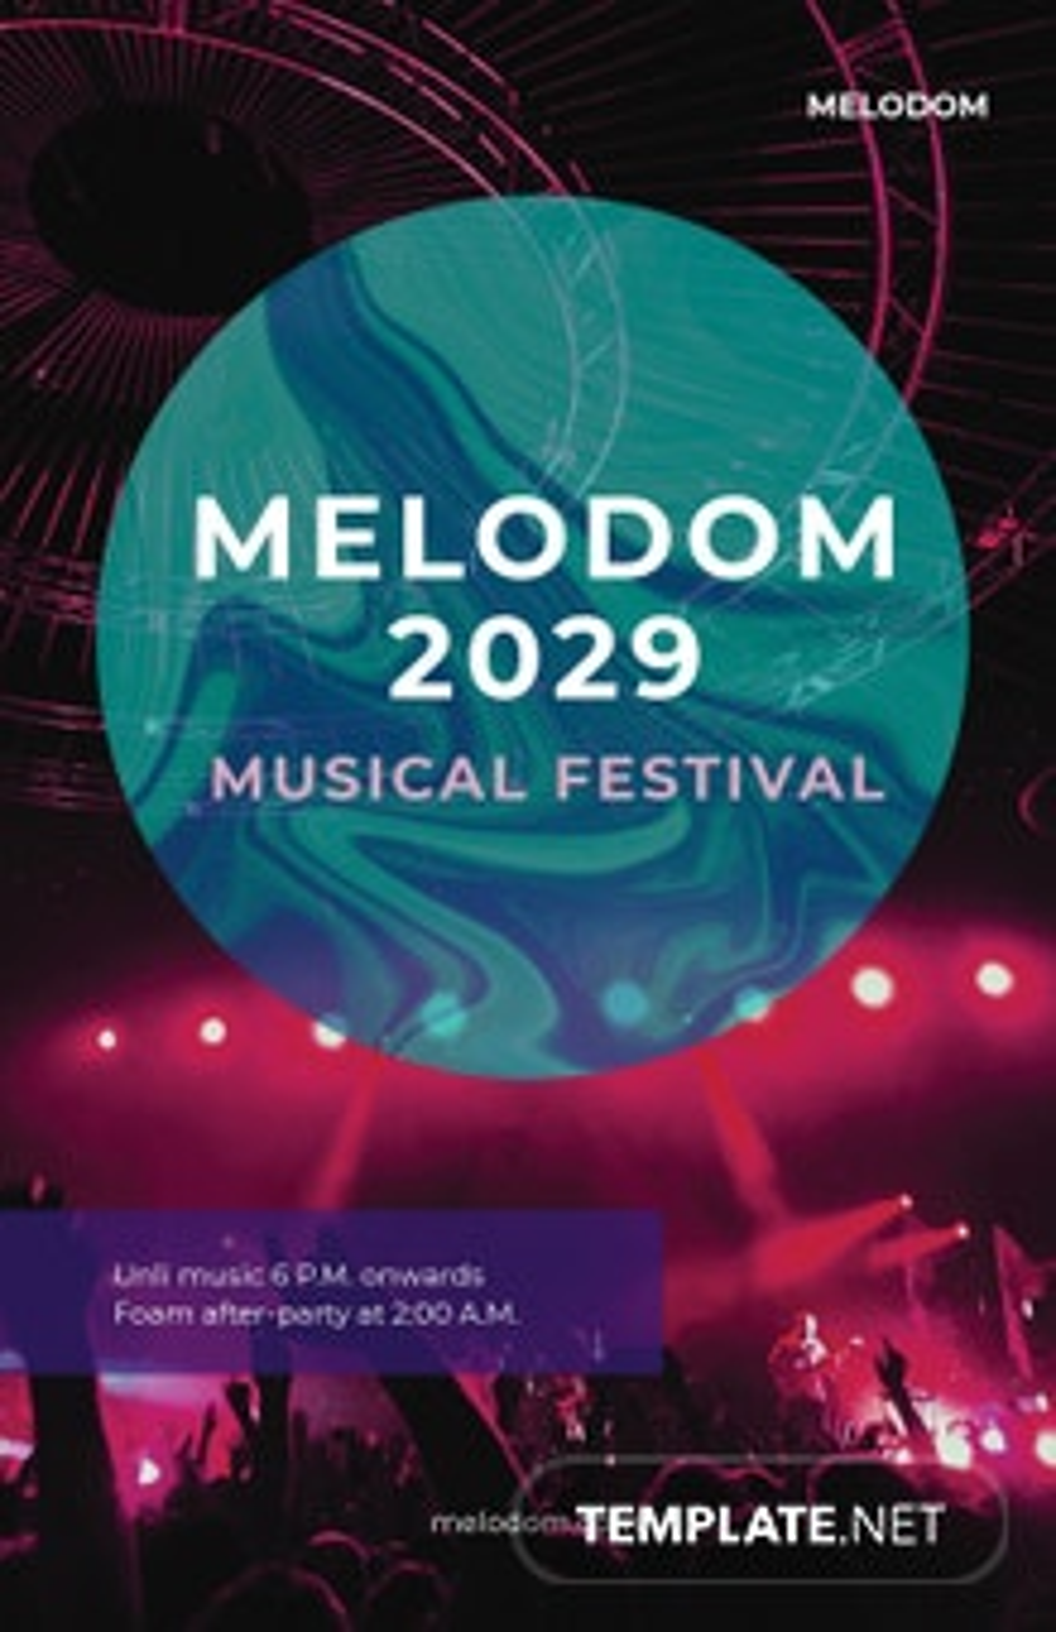 Creative Music Festival Poster Template